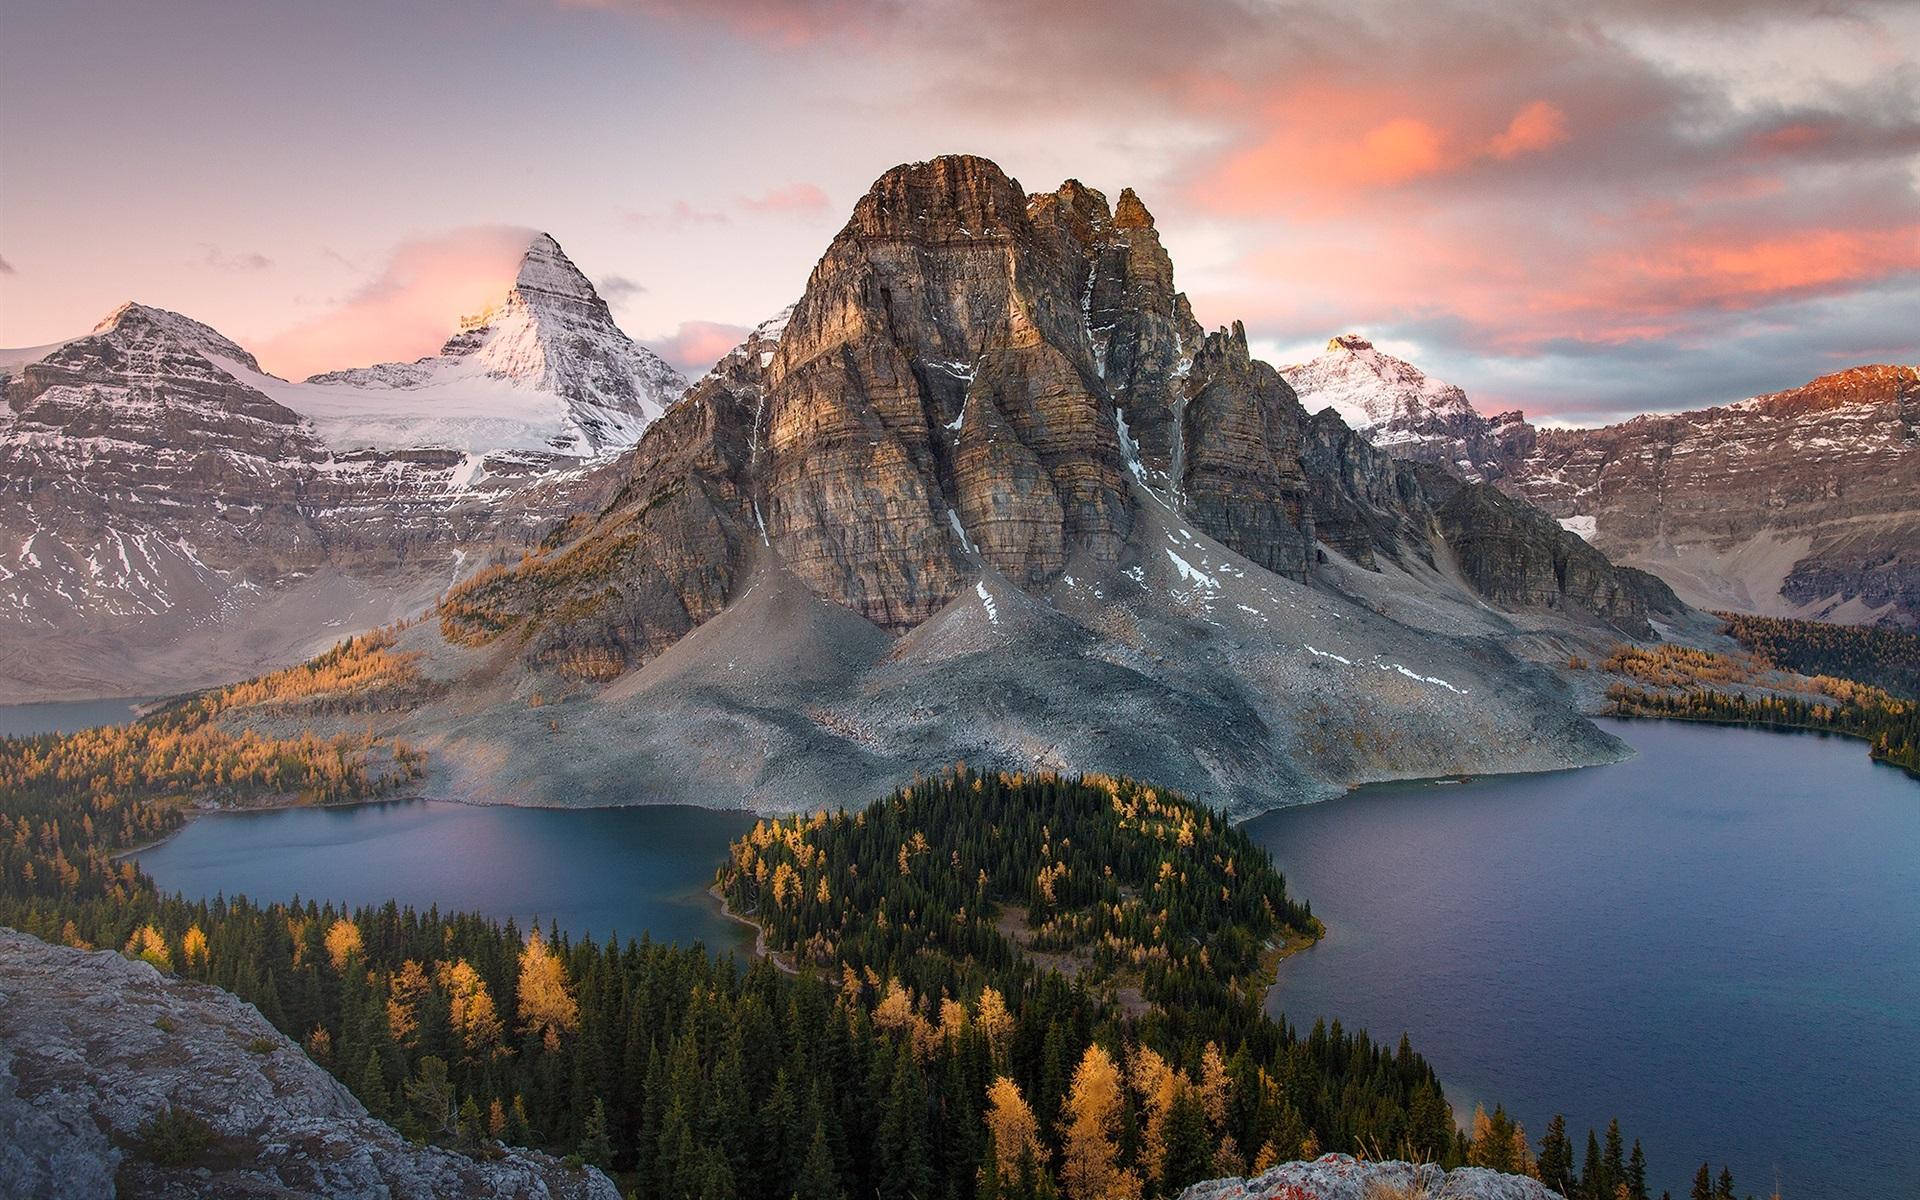 Kanada Berge See Wald Herbst 1920x1200 Hd Hintergrundbilder Hd